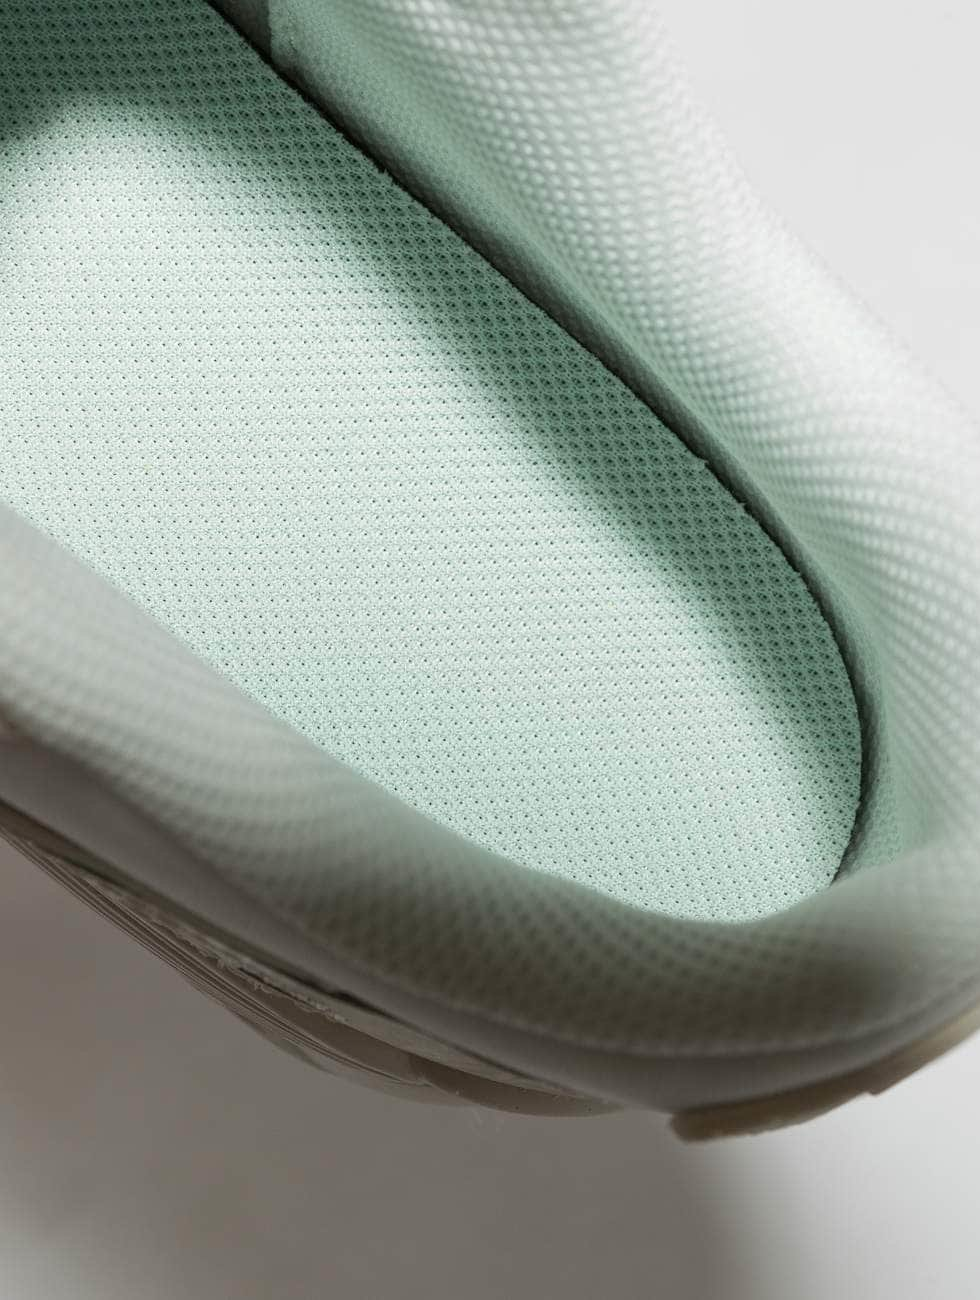 Nike schoen / sneaker Air Max 90 Mesh (GS) in beige 401952 Gratis Verzending Visum Betaling Korting Ebay Beste Wholesale Goedkope Prijs x5EqM